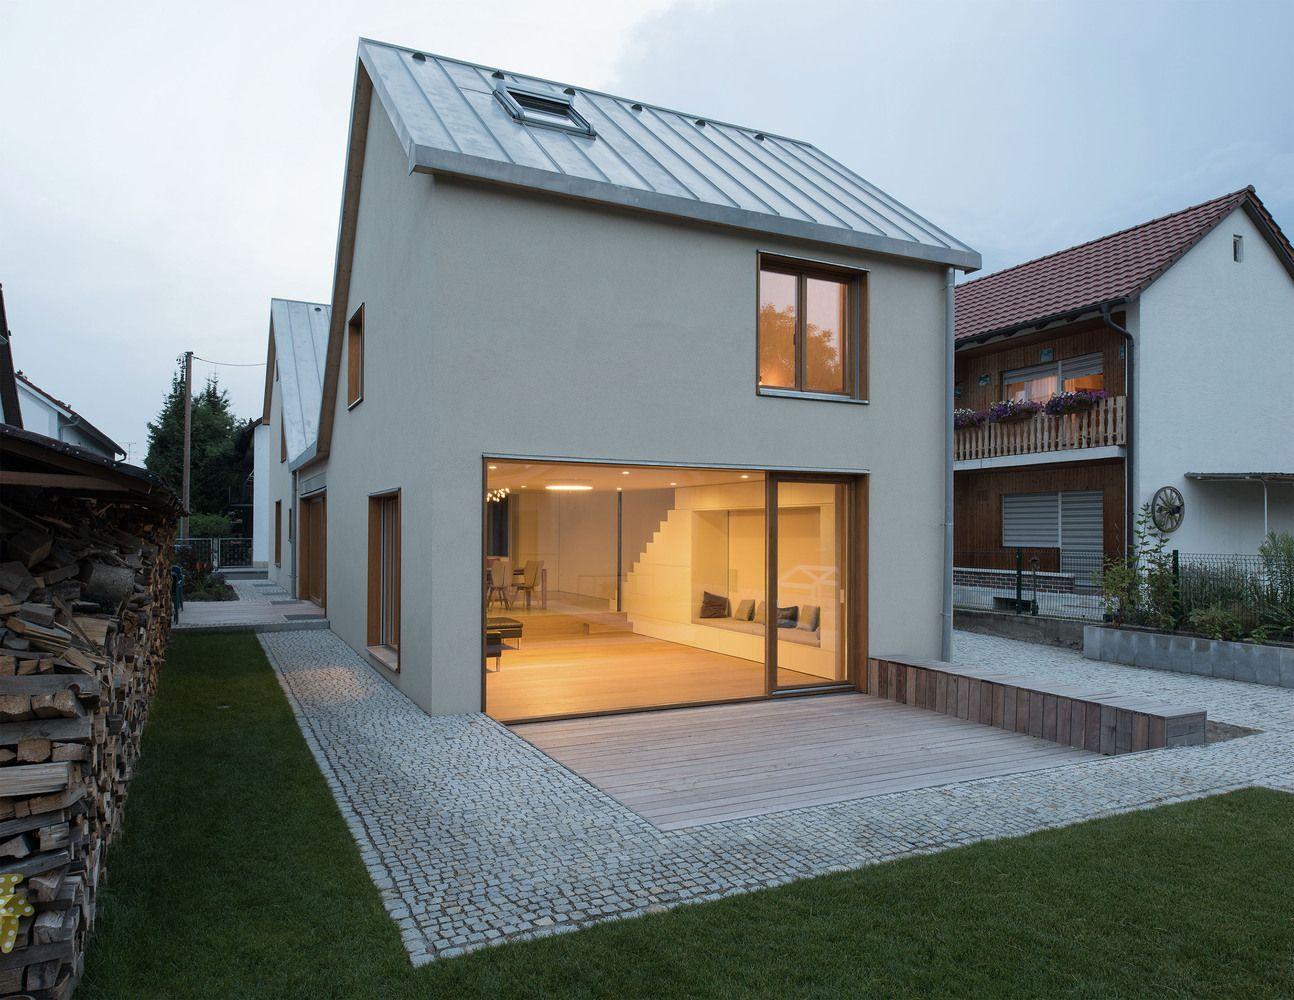 Gallery of Haus SPK / nbundm* - 8